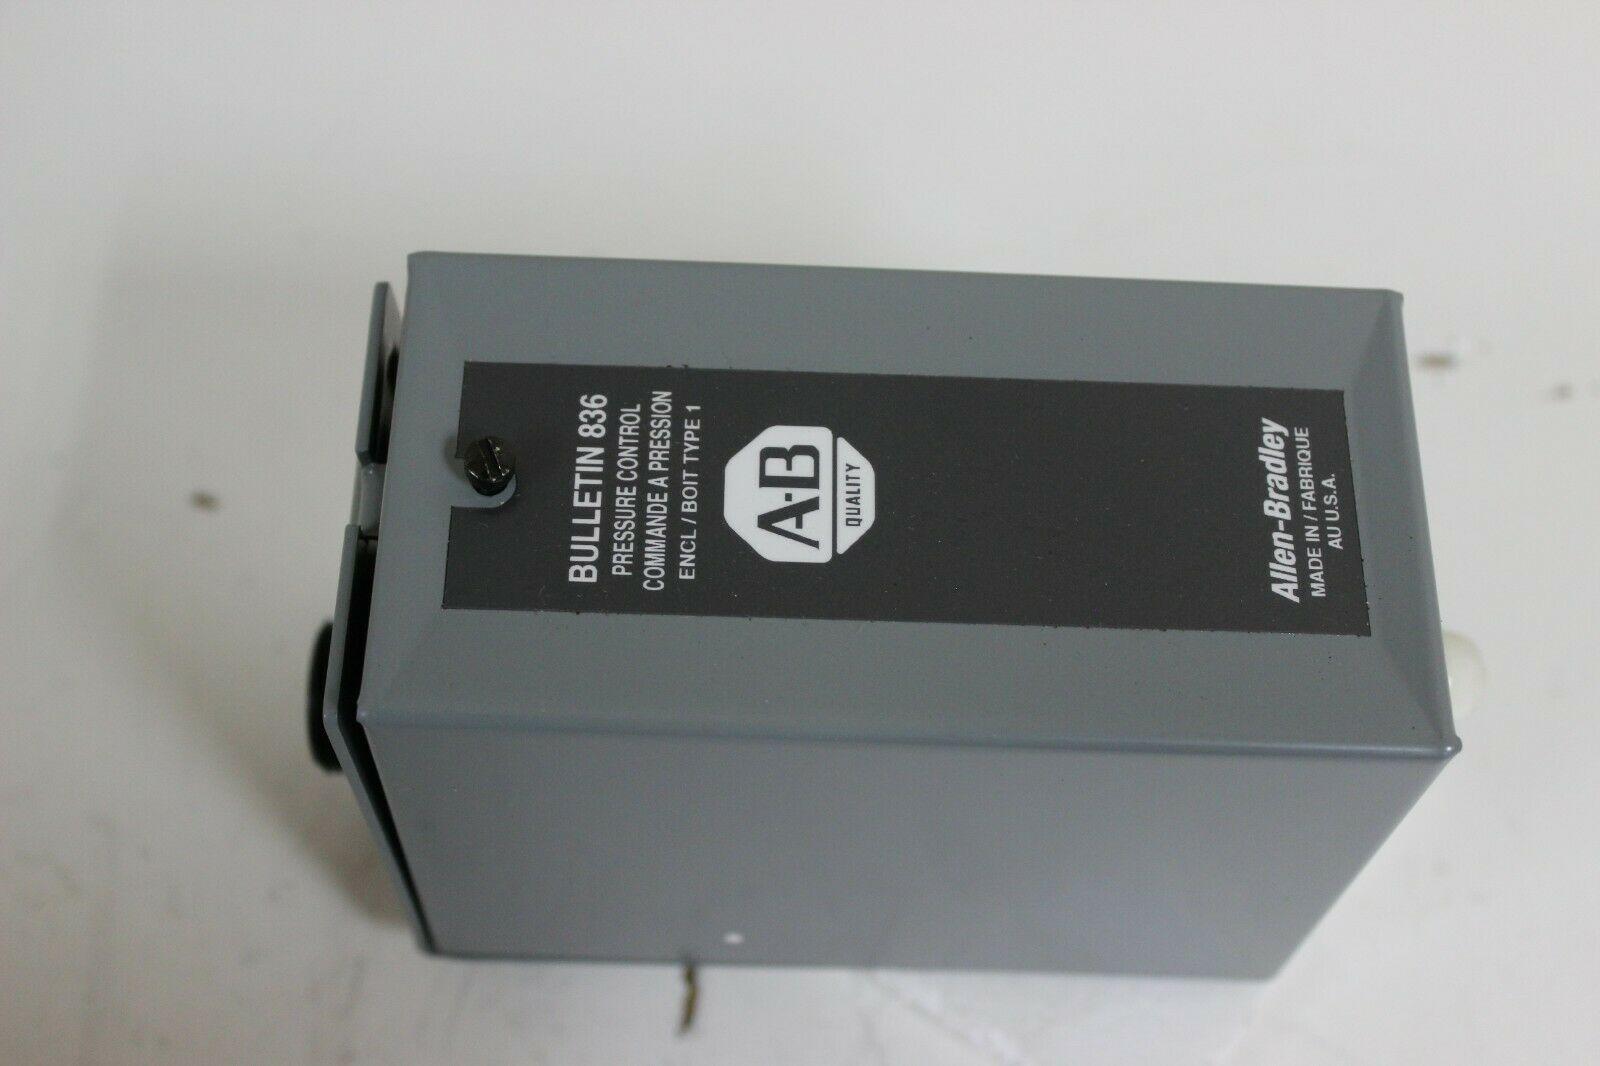 Allen-Bradley 836-A2AX42 Bulletin 836 Pressure Control New